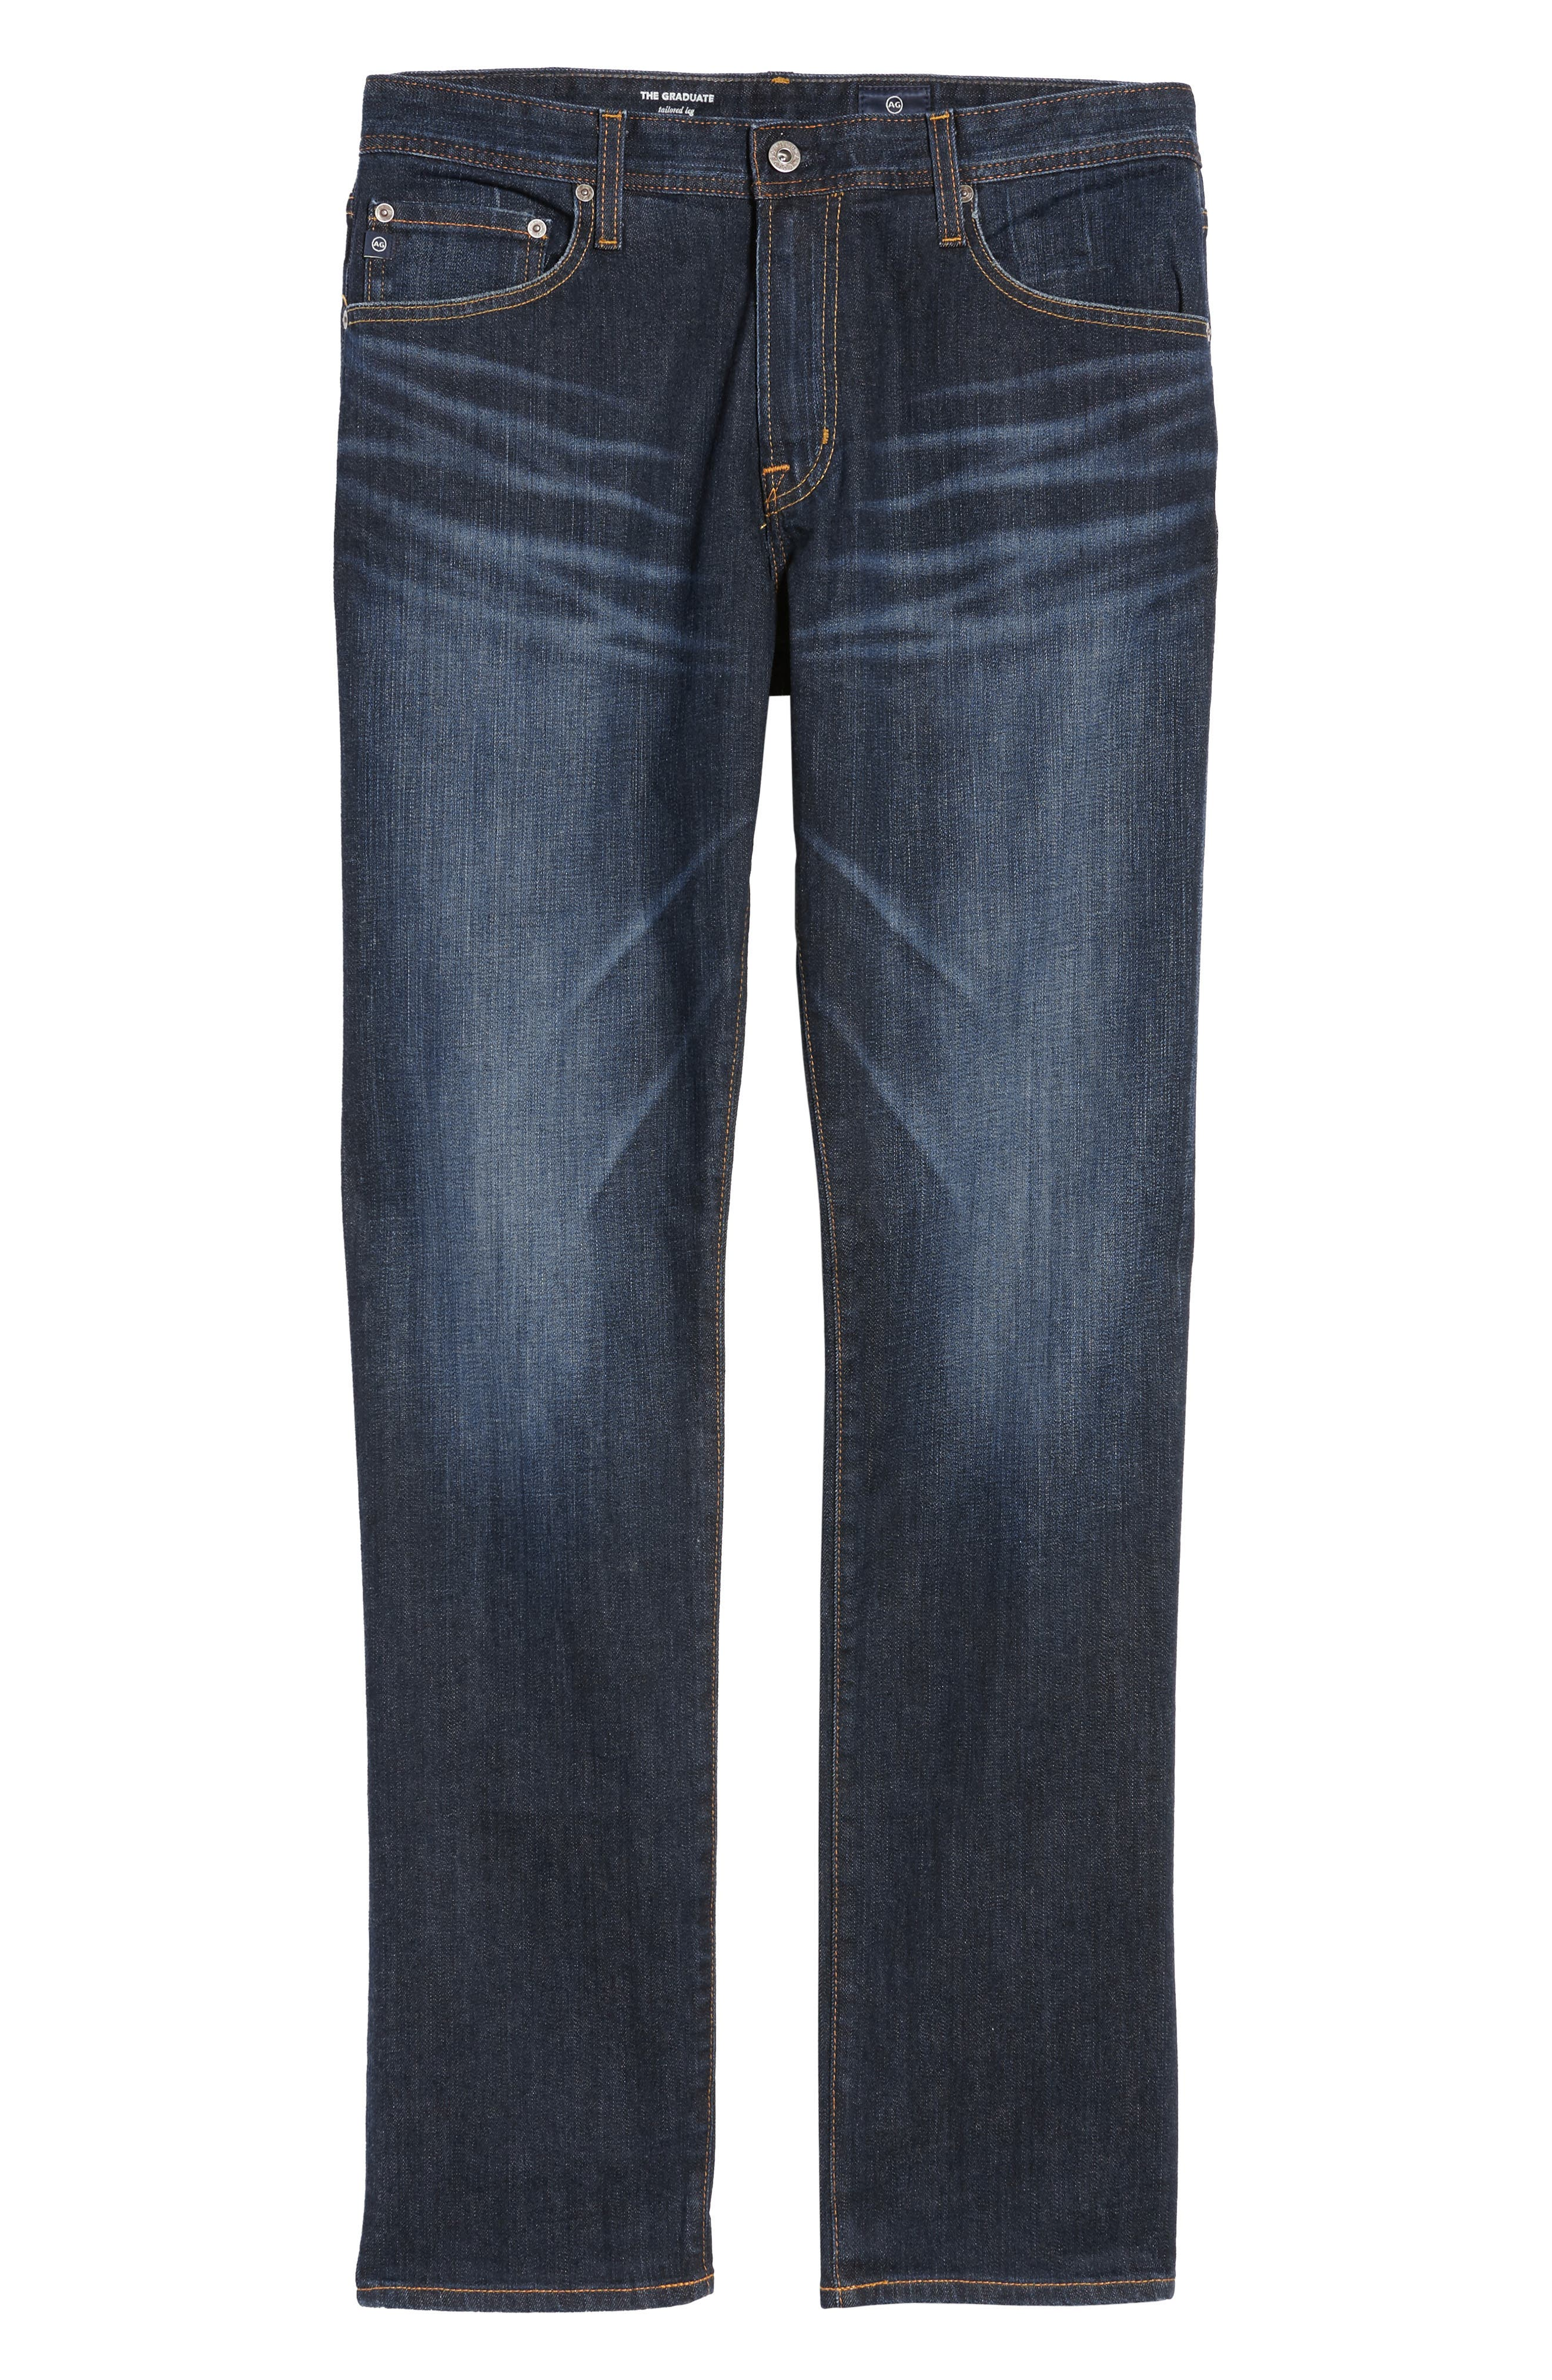 Graduate Slim Straight Leg Jeans,                         Main,                         color, ROBINSON